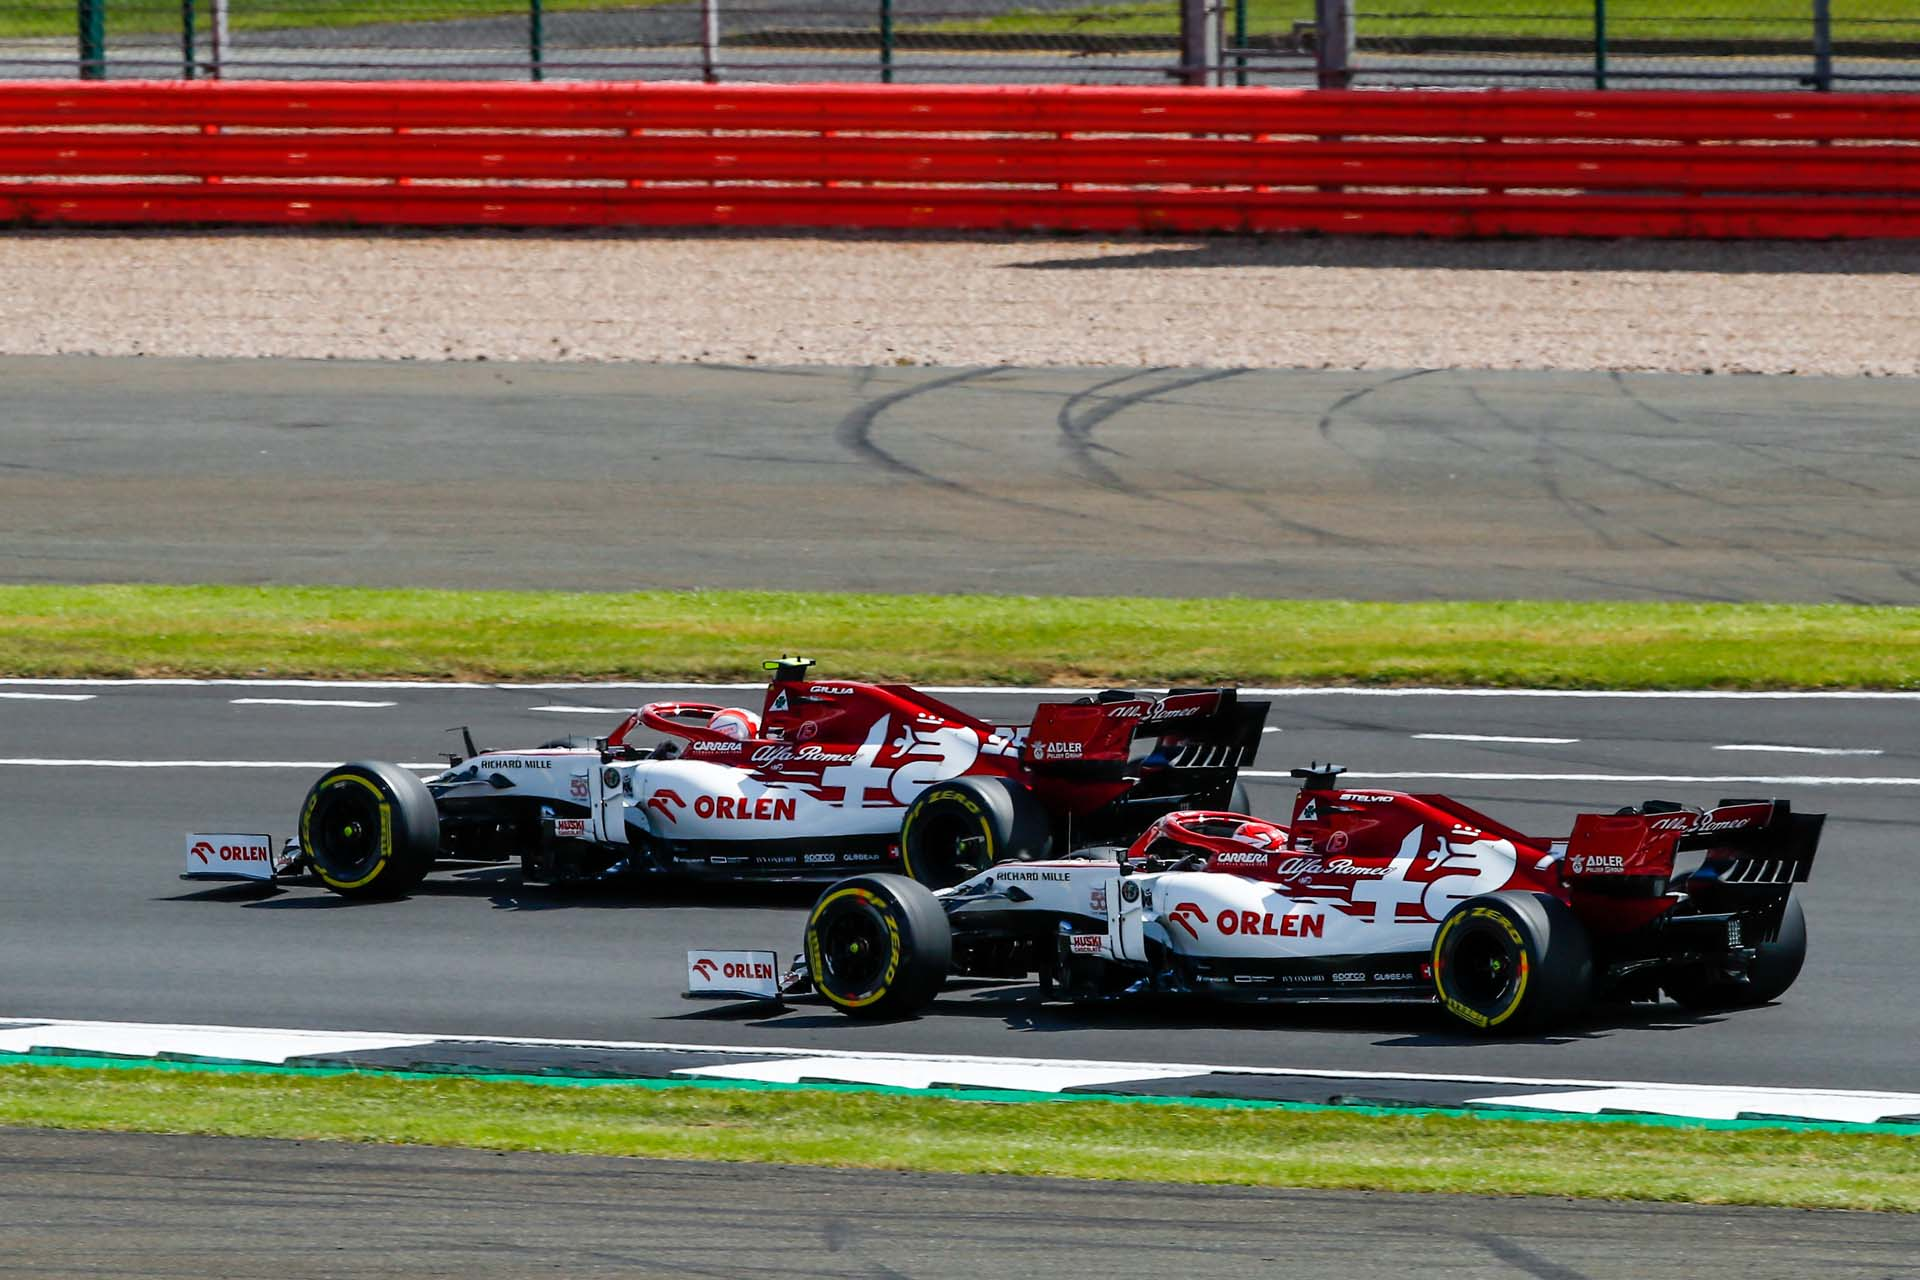 F1 - BRITISH GRAND PRIX 2020 - PART 2